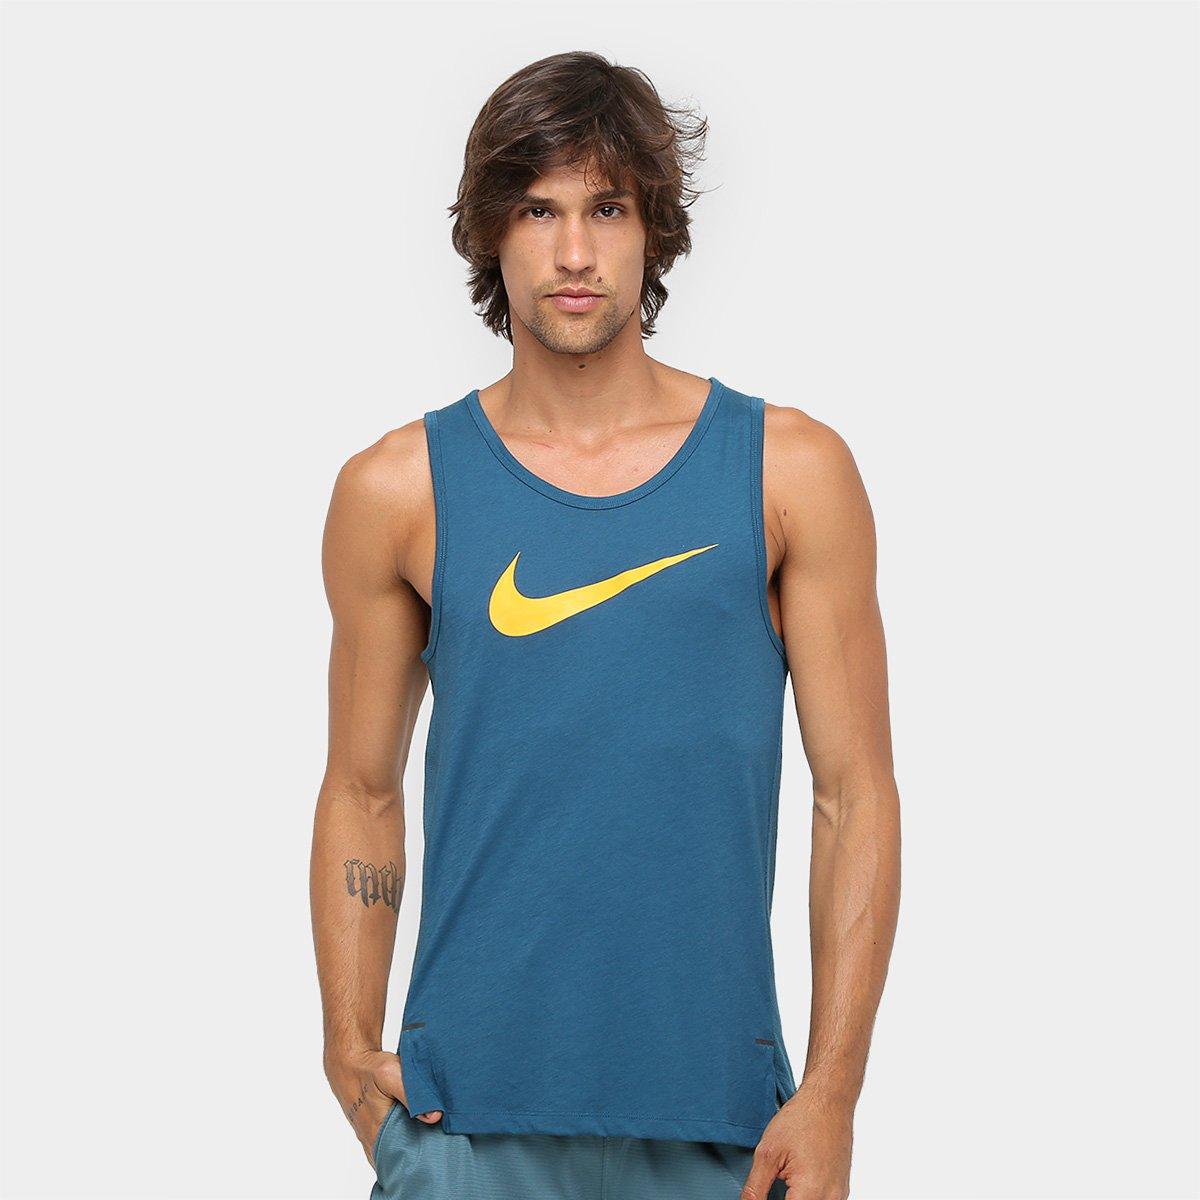 046b7be01a Camiseta Regata Nike Top SL Elite Masculina - Compre Agora